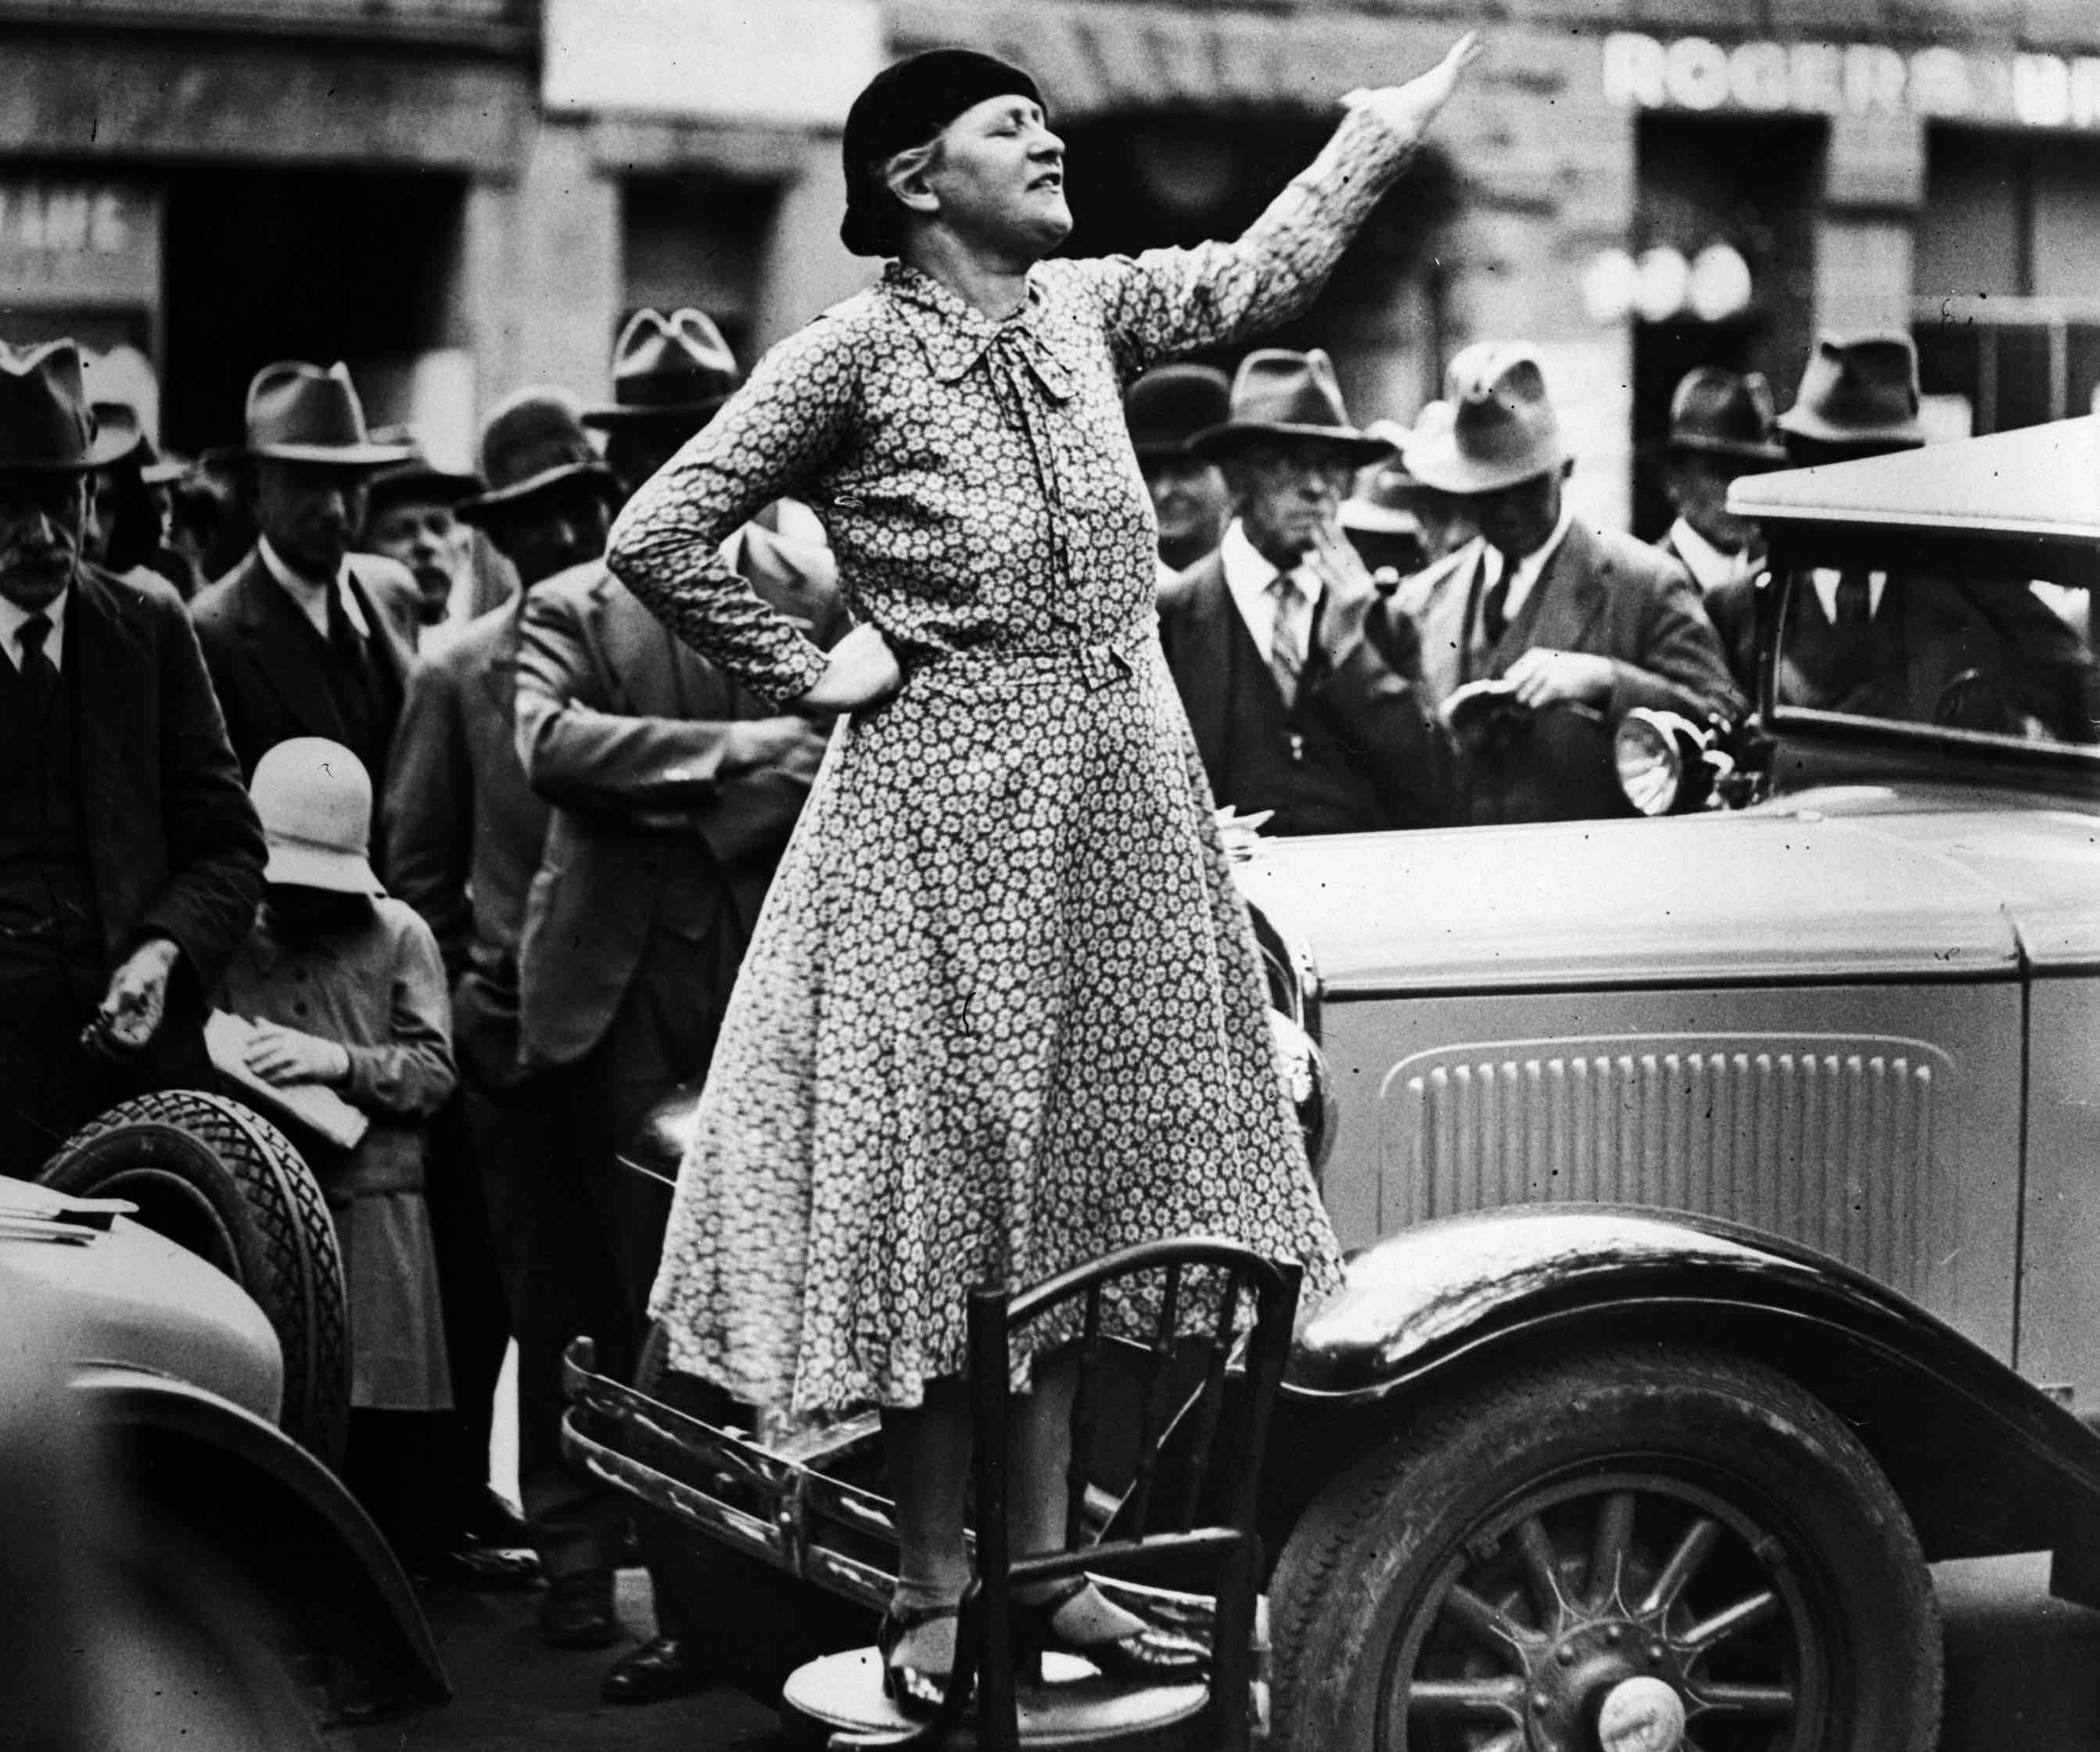 Adela Pankhurst, earlier a member of the Women's Peace Army, speaking in Sydney in 1931. (Photo: Fox Photos/Getty)